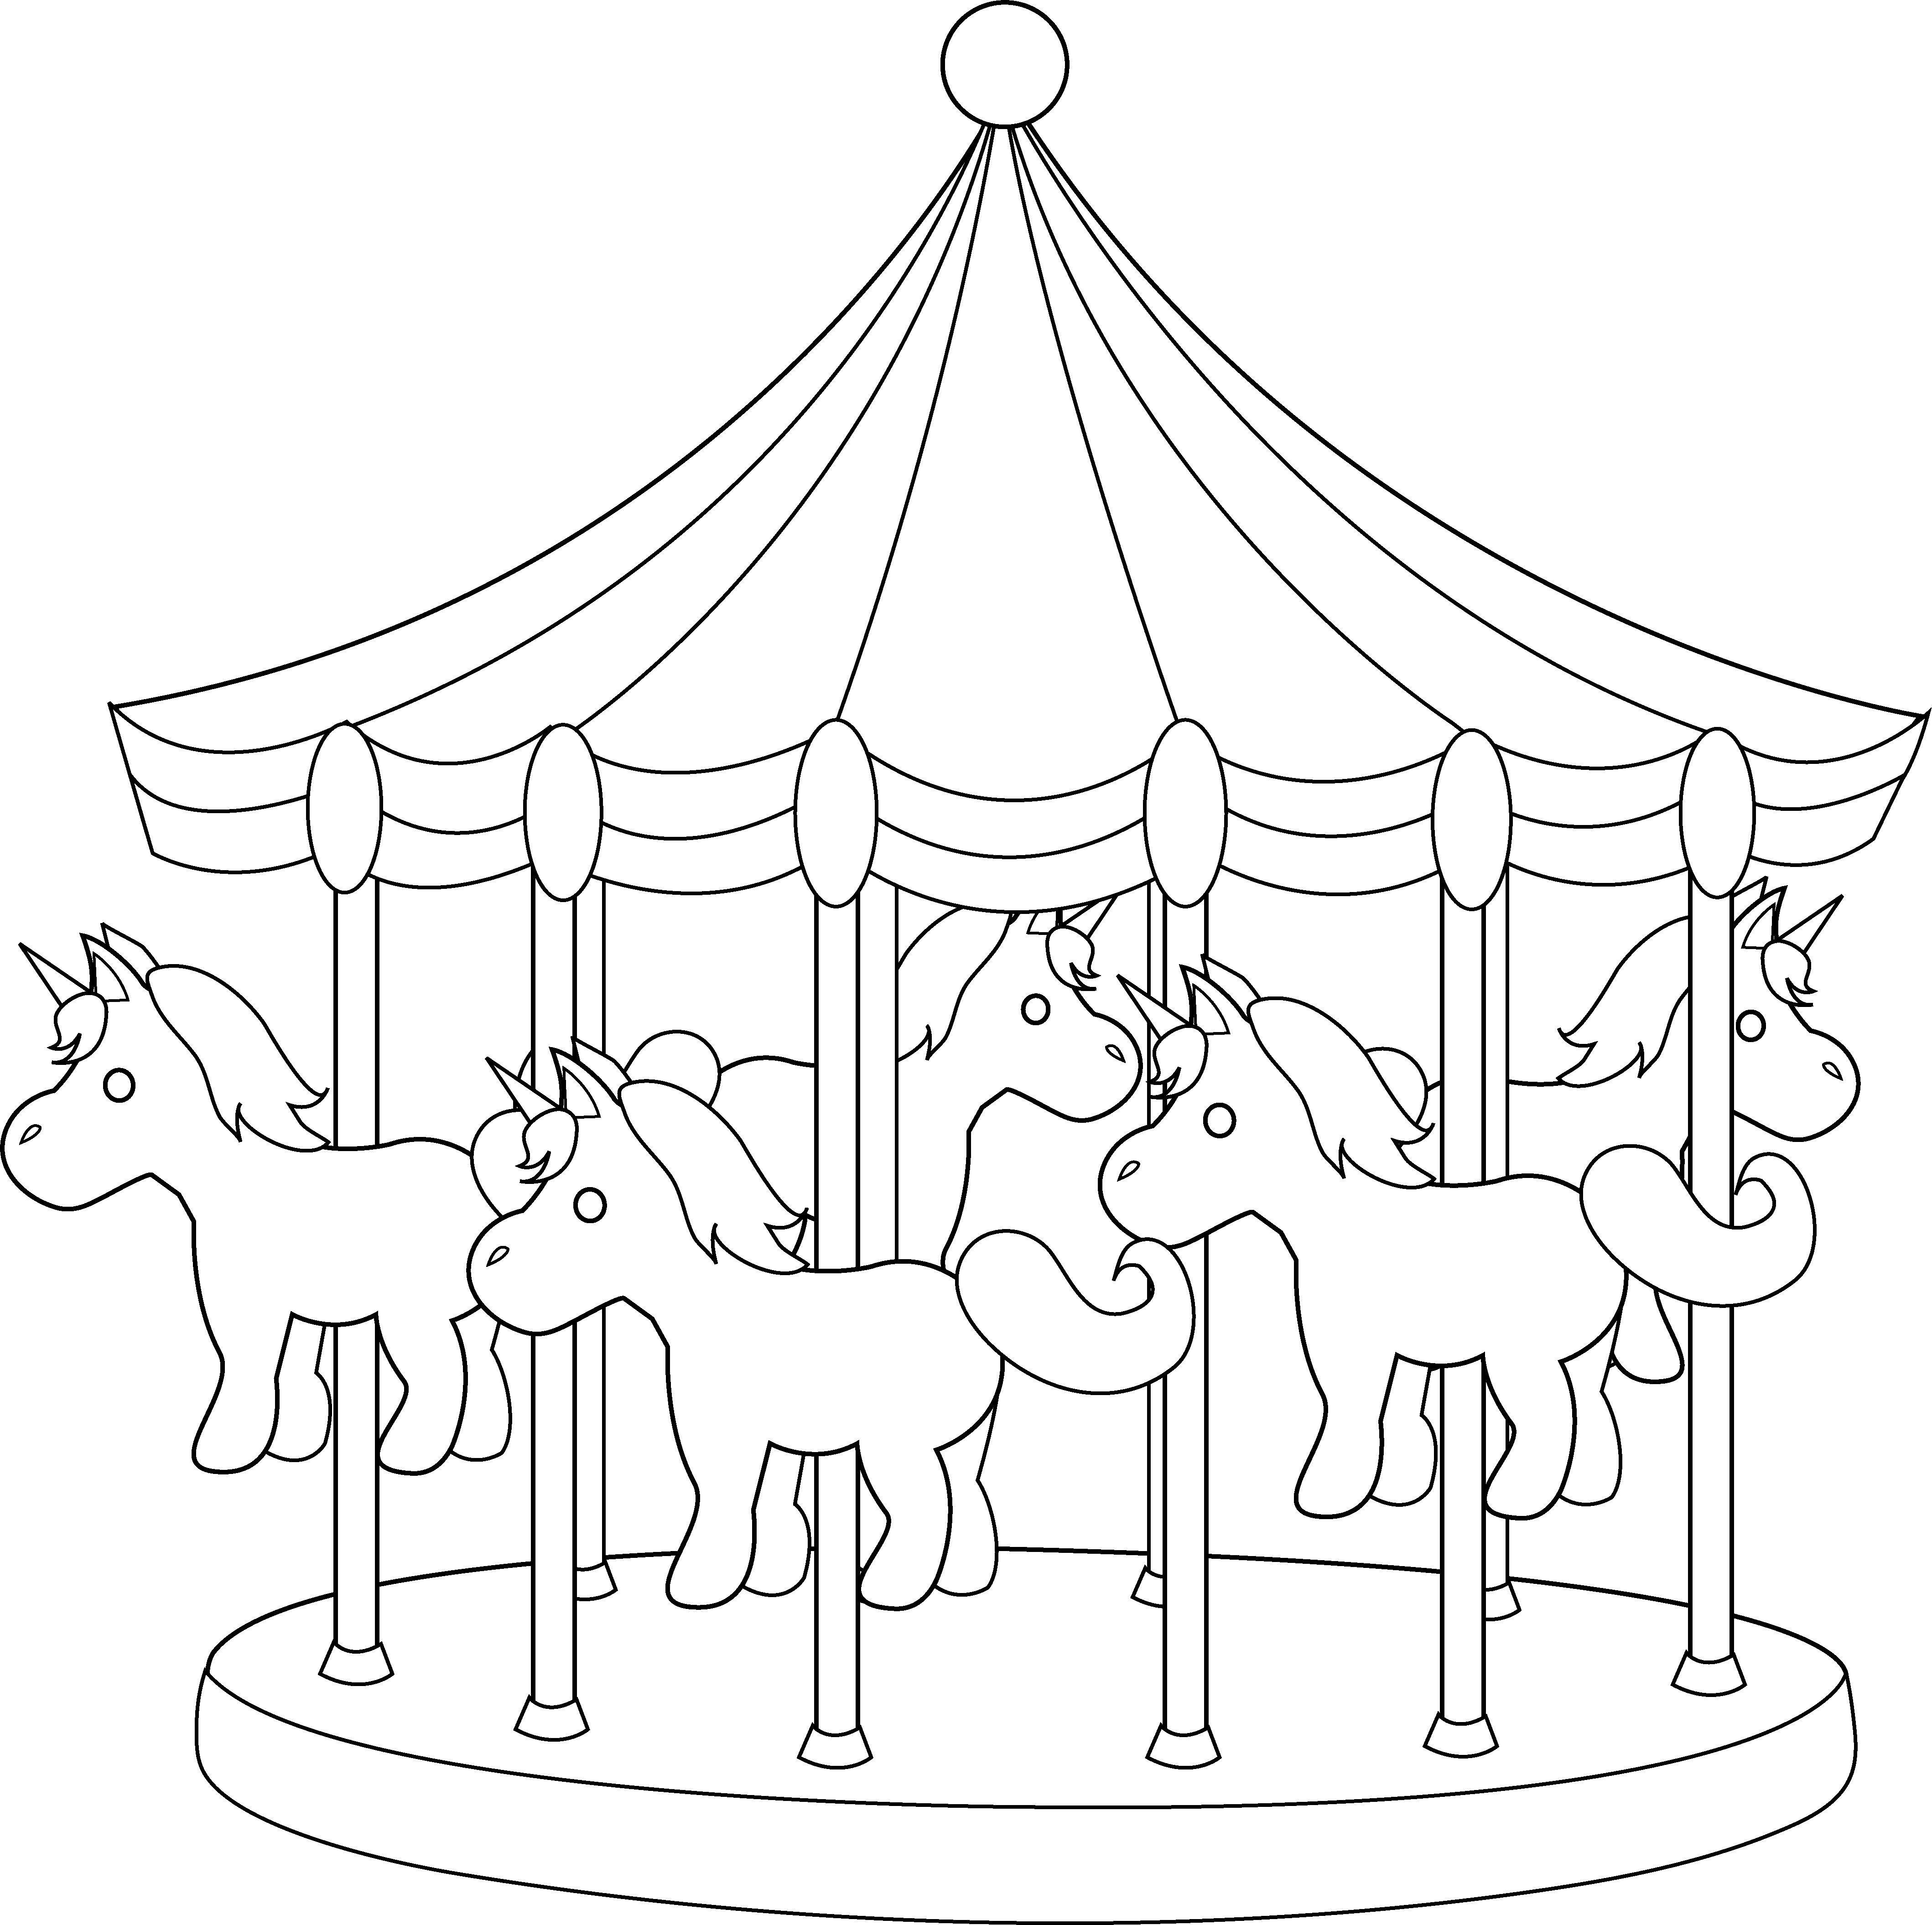 Carousel clipart carnival Coloring Carousel Art Line Carousel